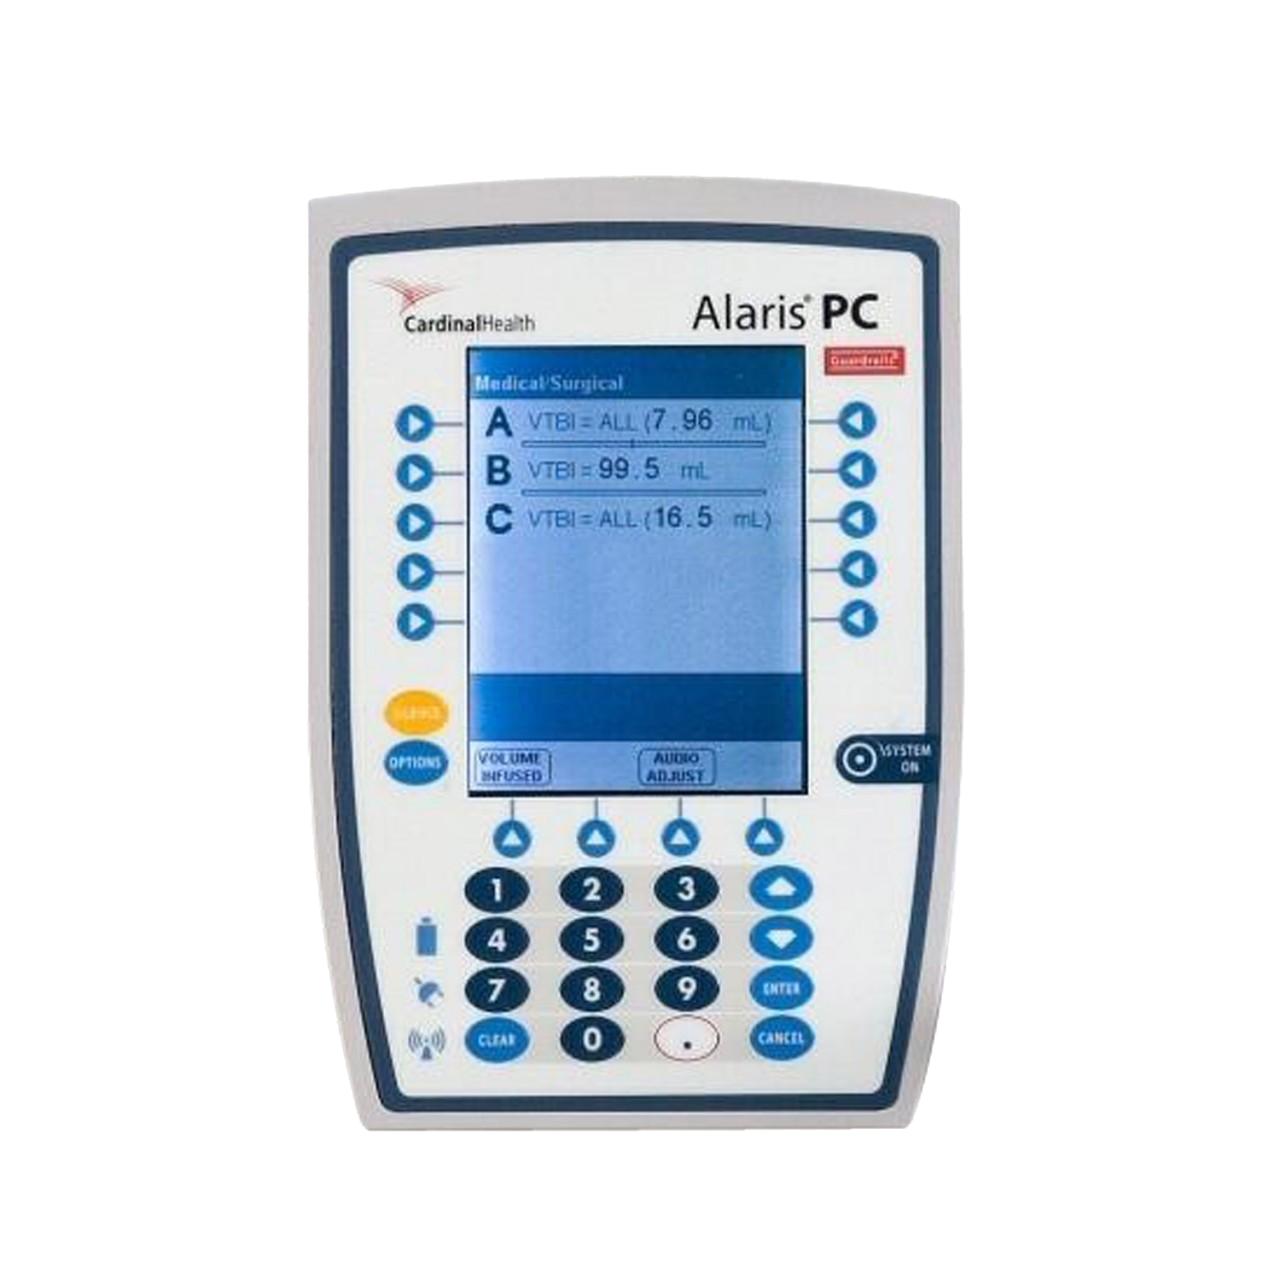 Alaris Carefusion 8015 PCU Infusion Pumps Image